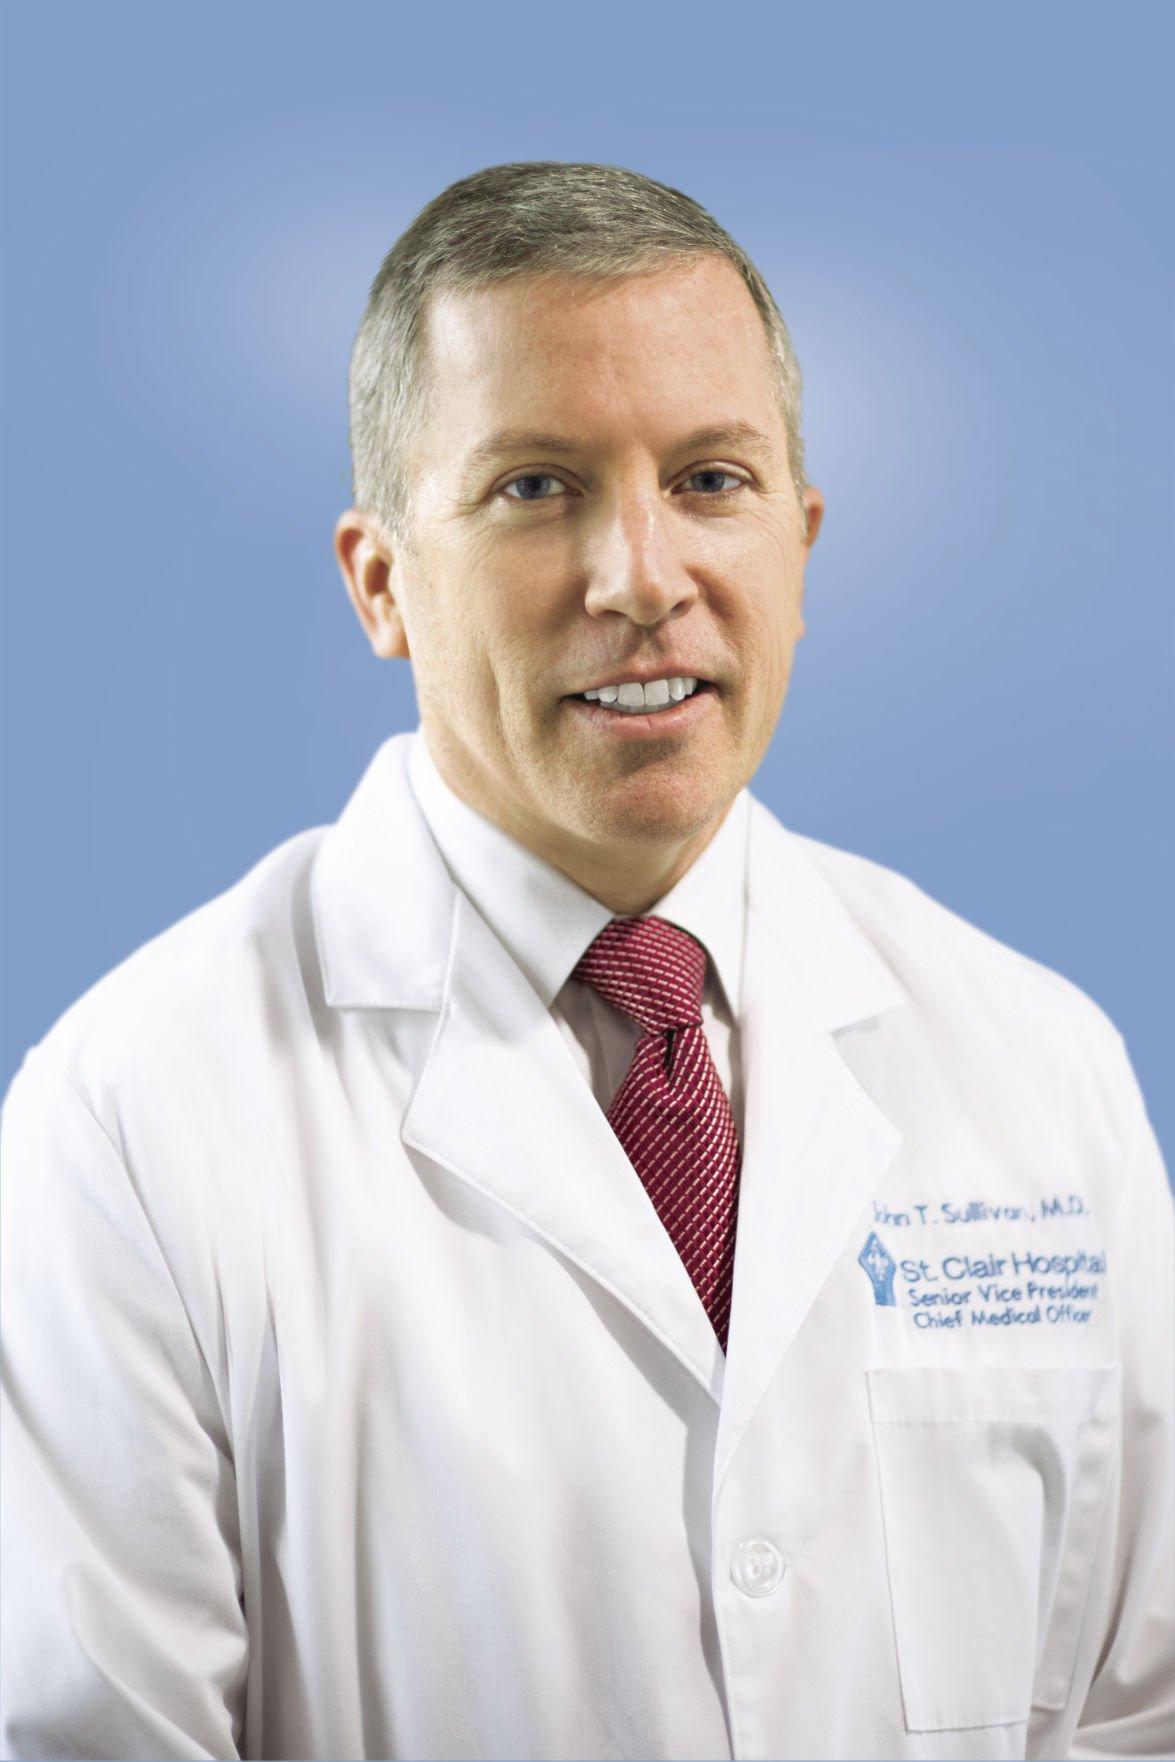 Dr. John T. Sullivan